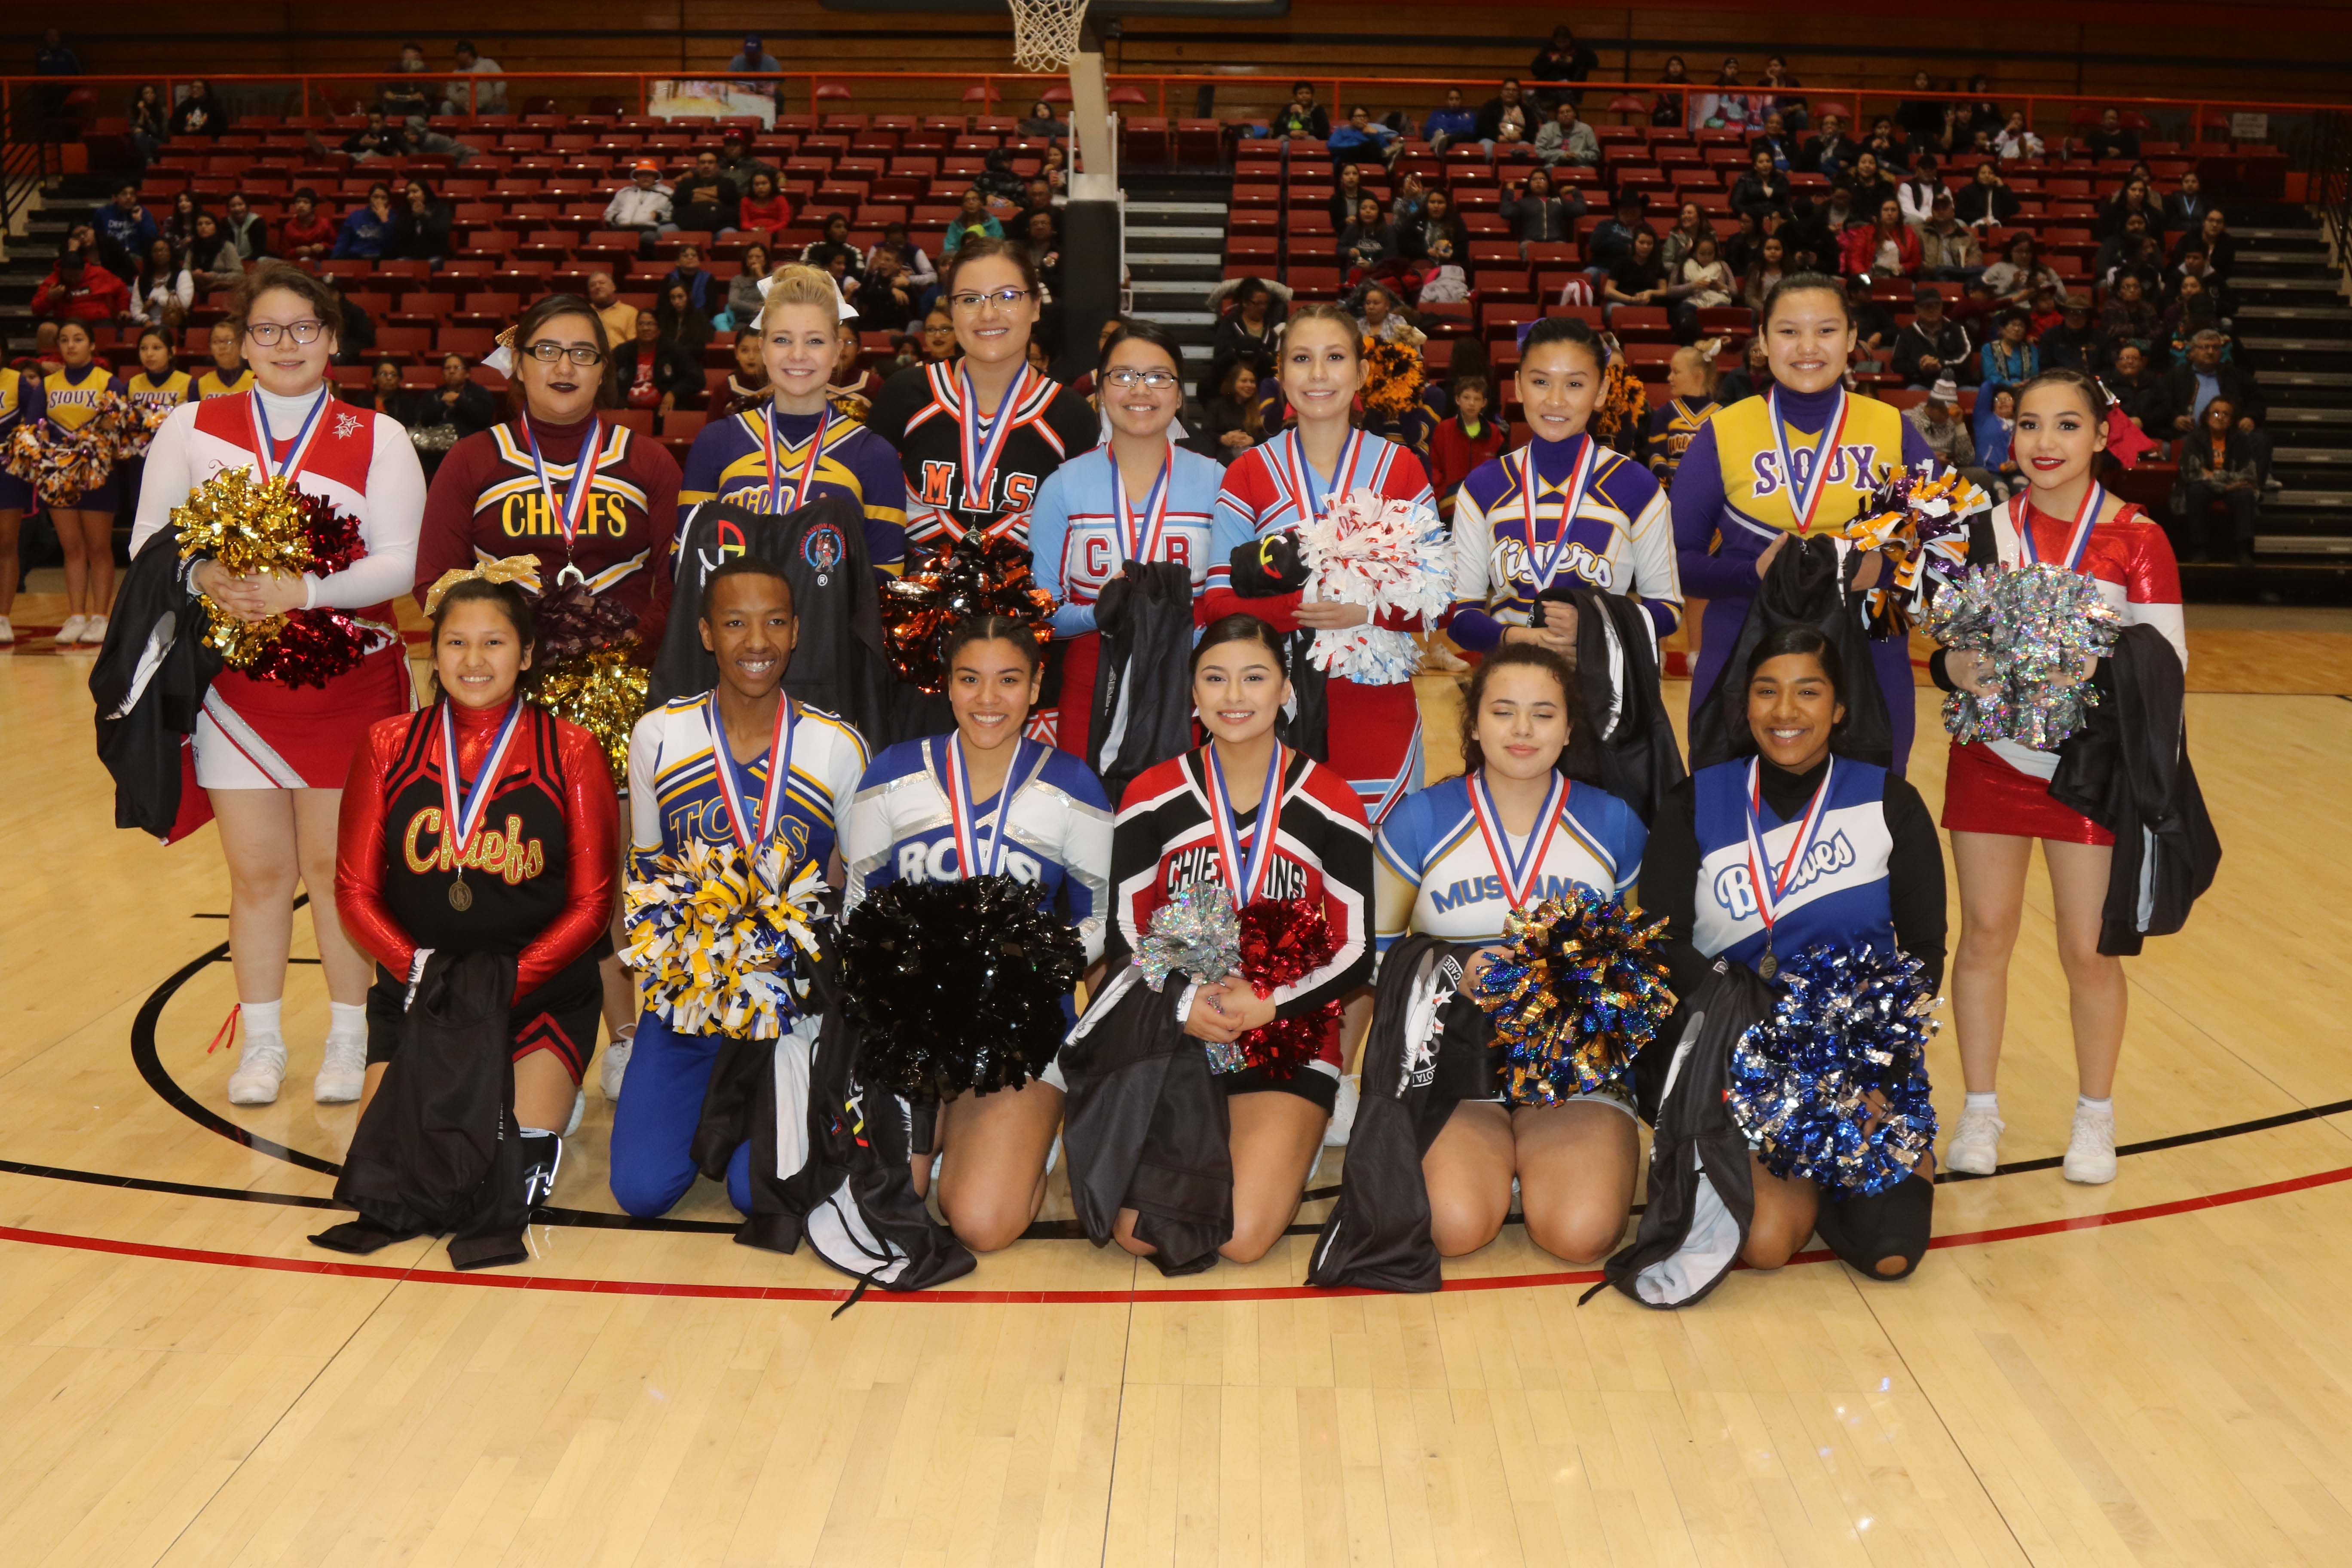 All Tourney Cheerleaders